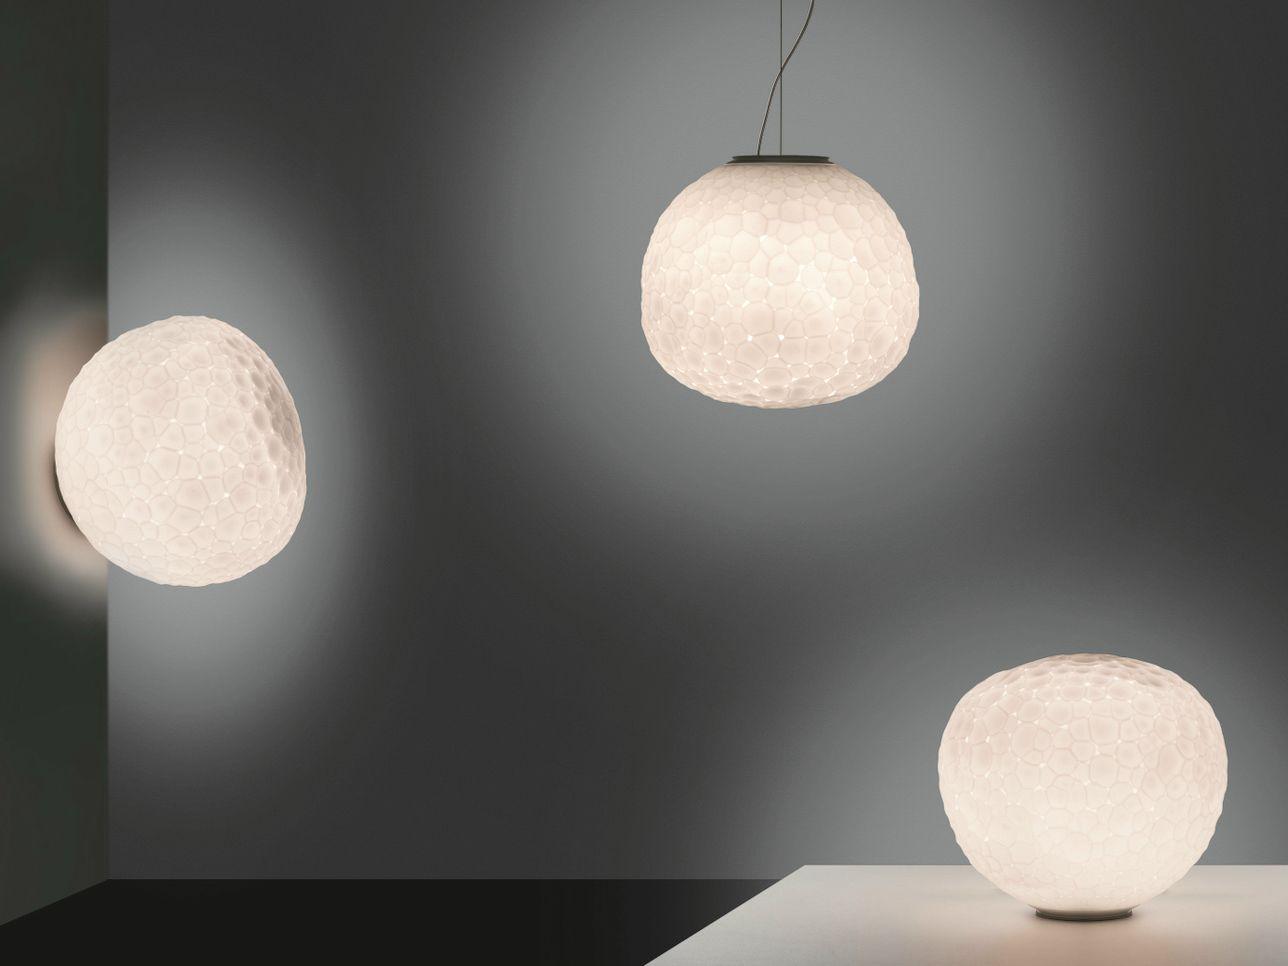 Catenaria Di Lampadine Ikea : ... Artemide echos lámpara di lampada ...